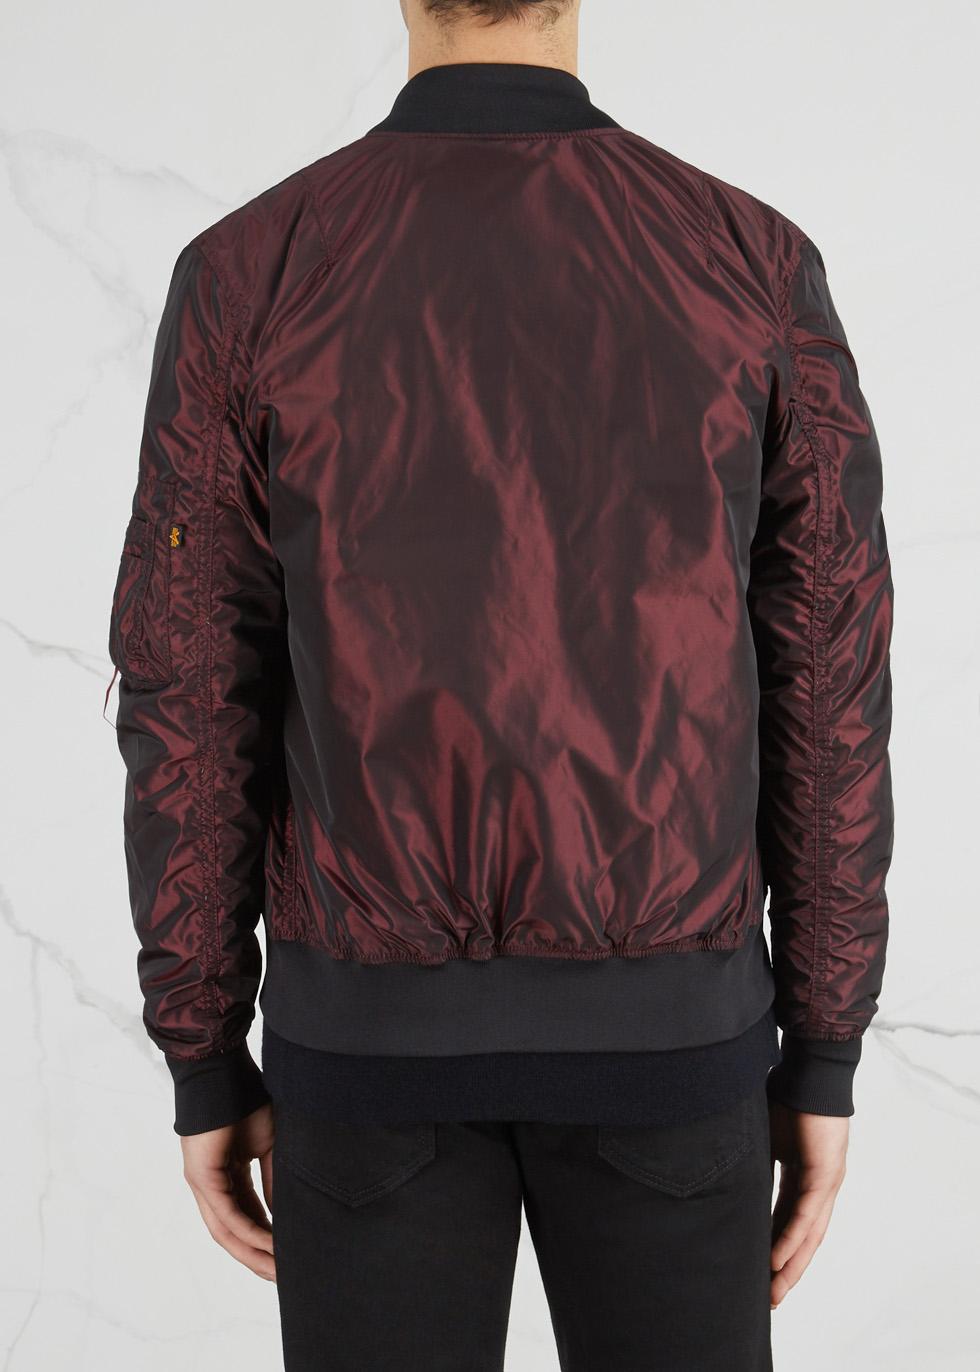 MA-1 metallic burgundy shell bomber jacket - Alpha Industries